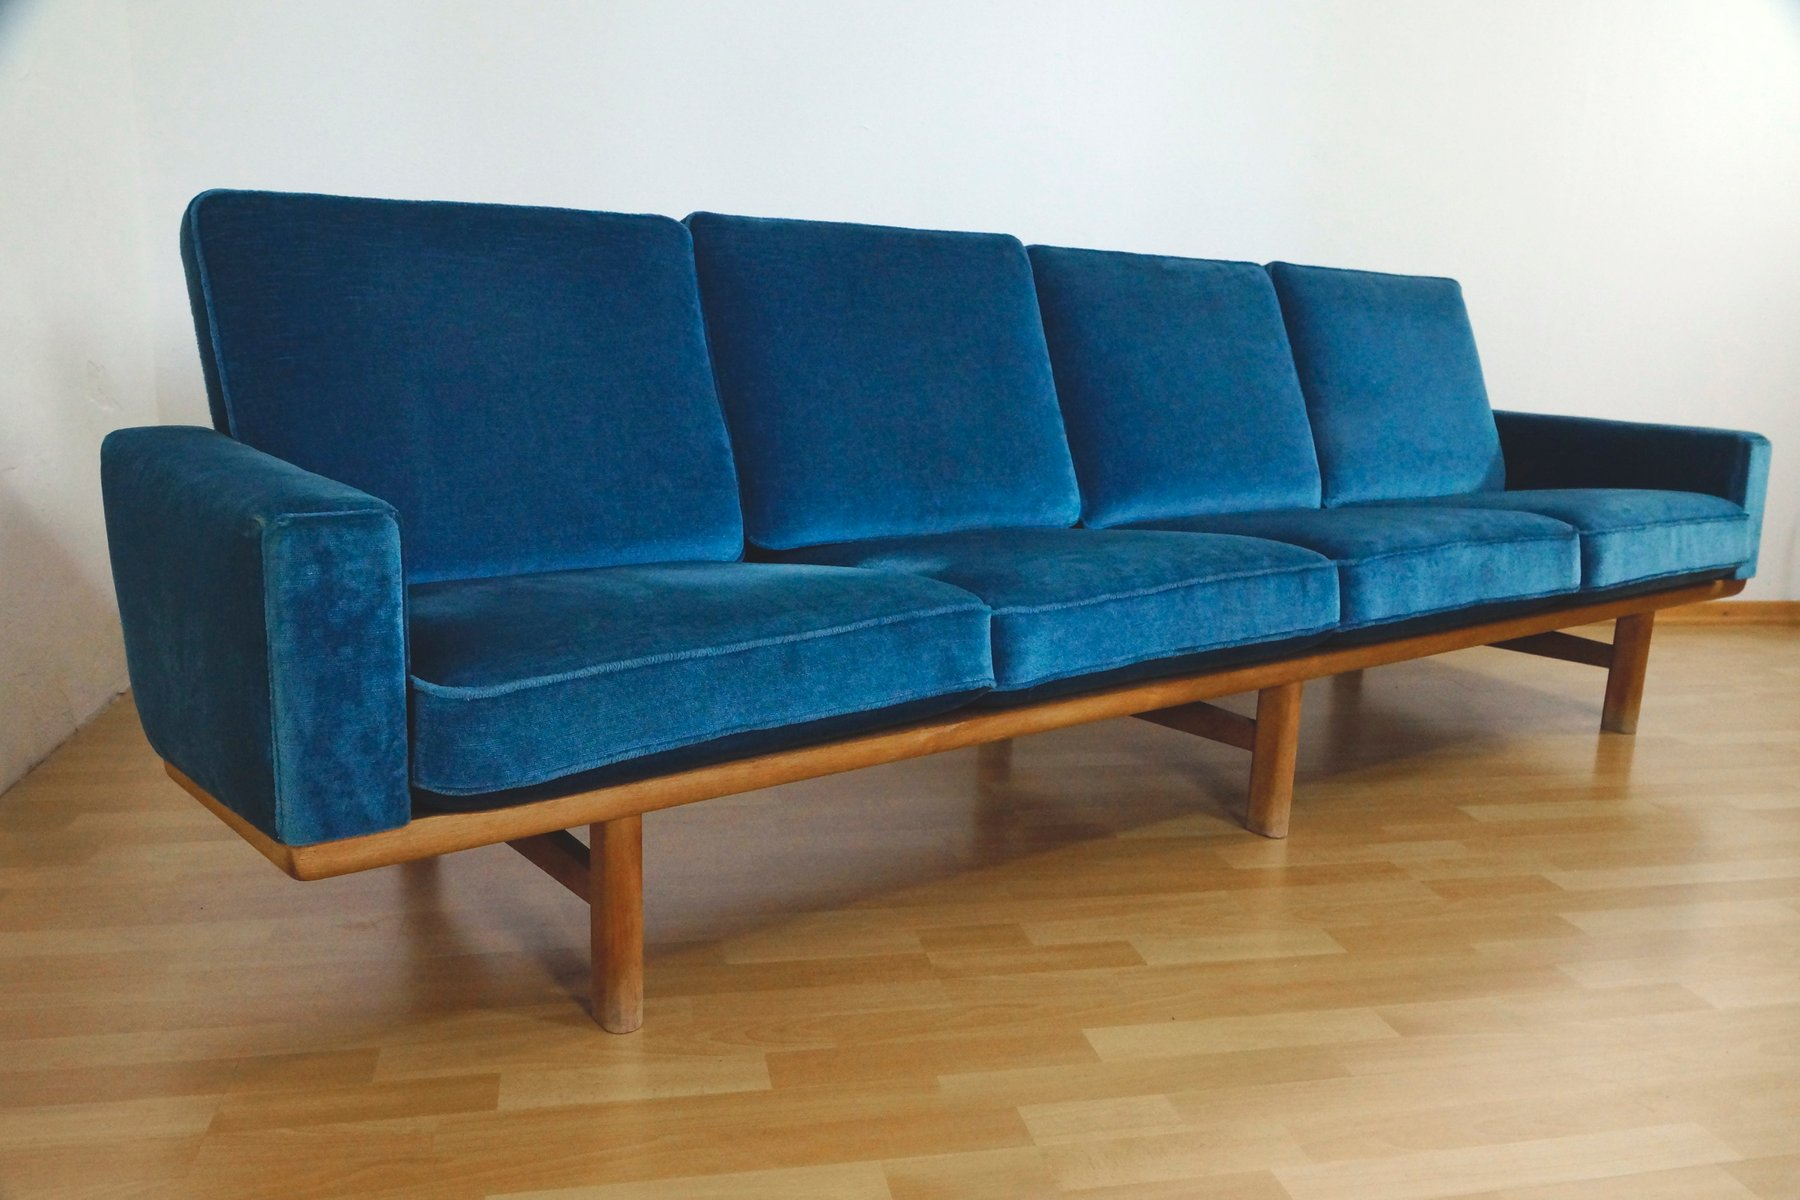 Velour sofas thesofa for Velour divan beds